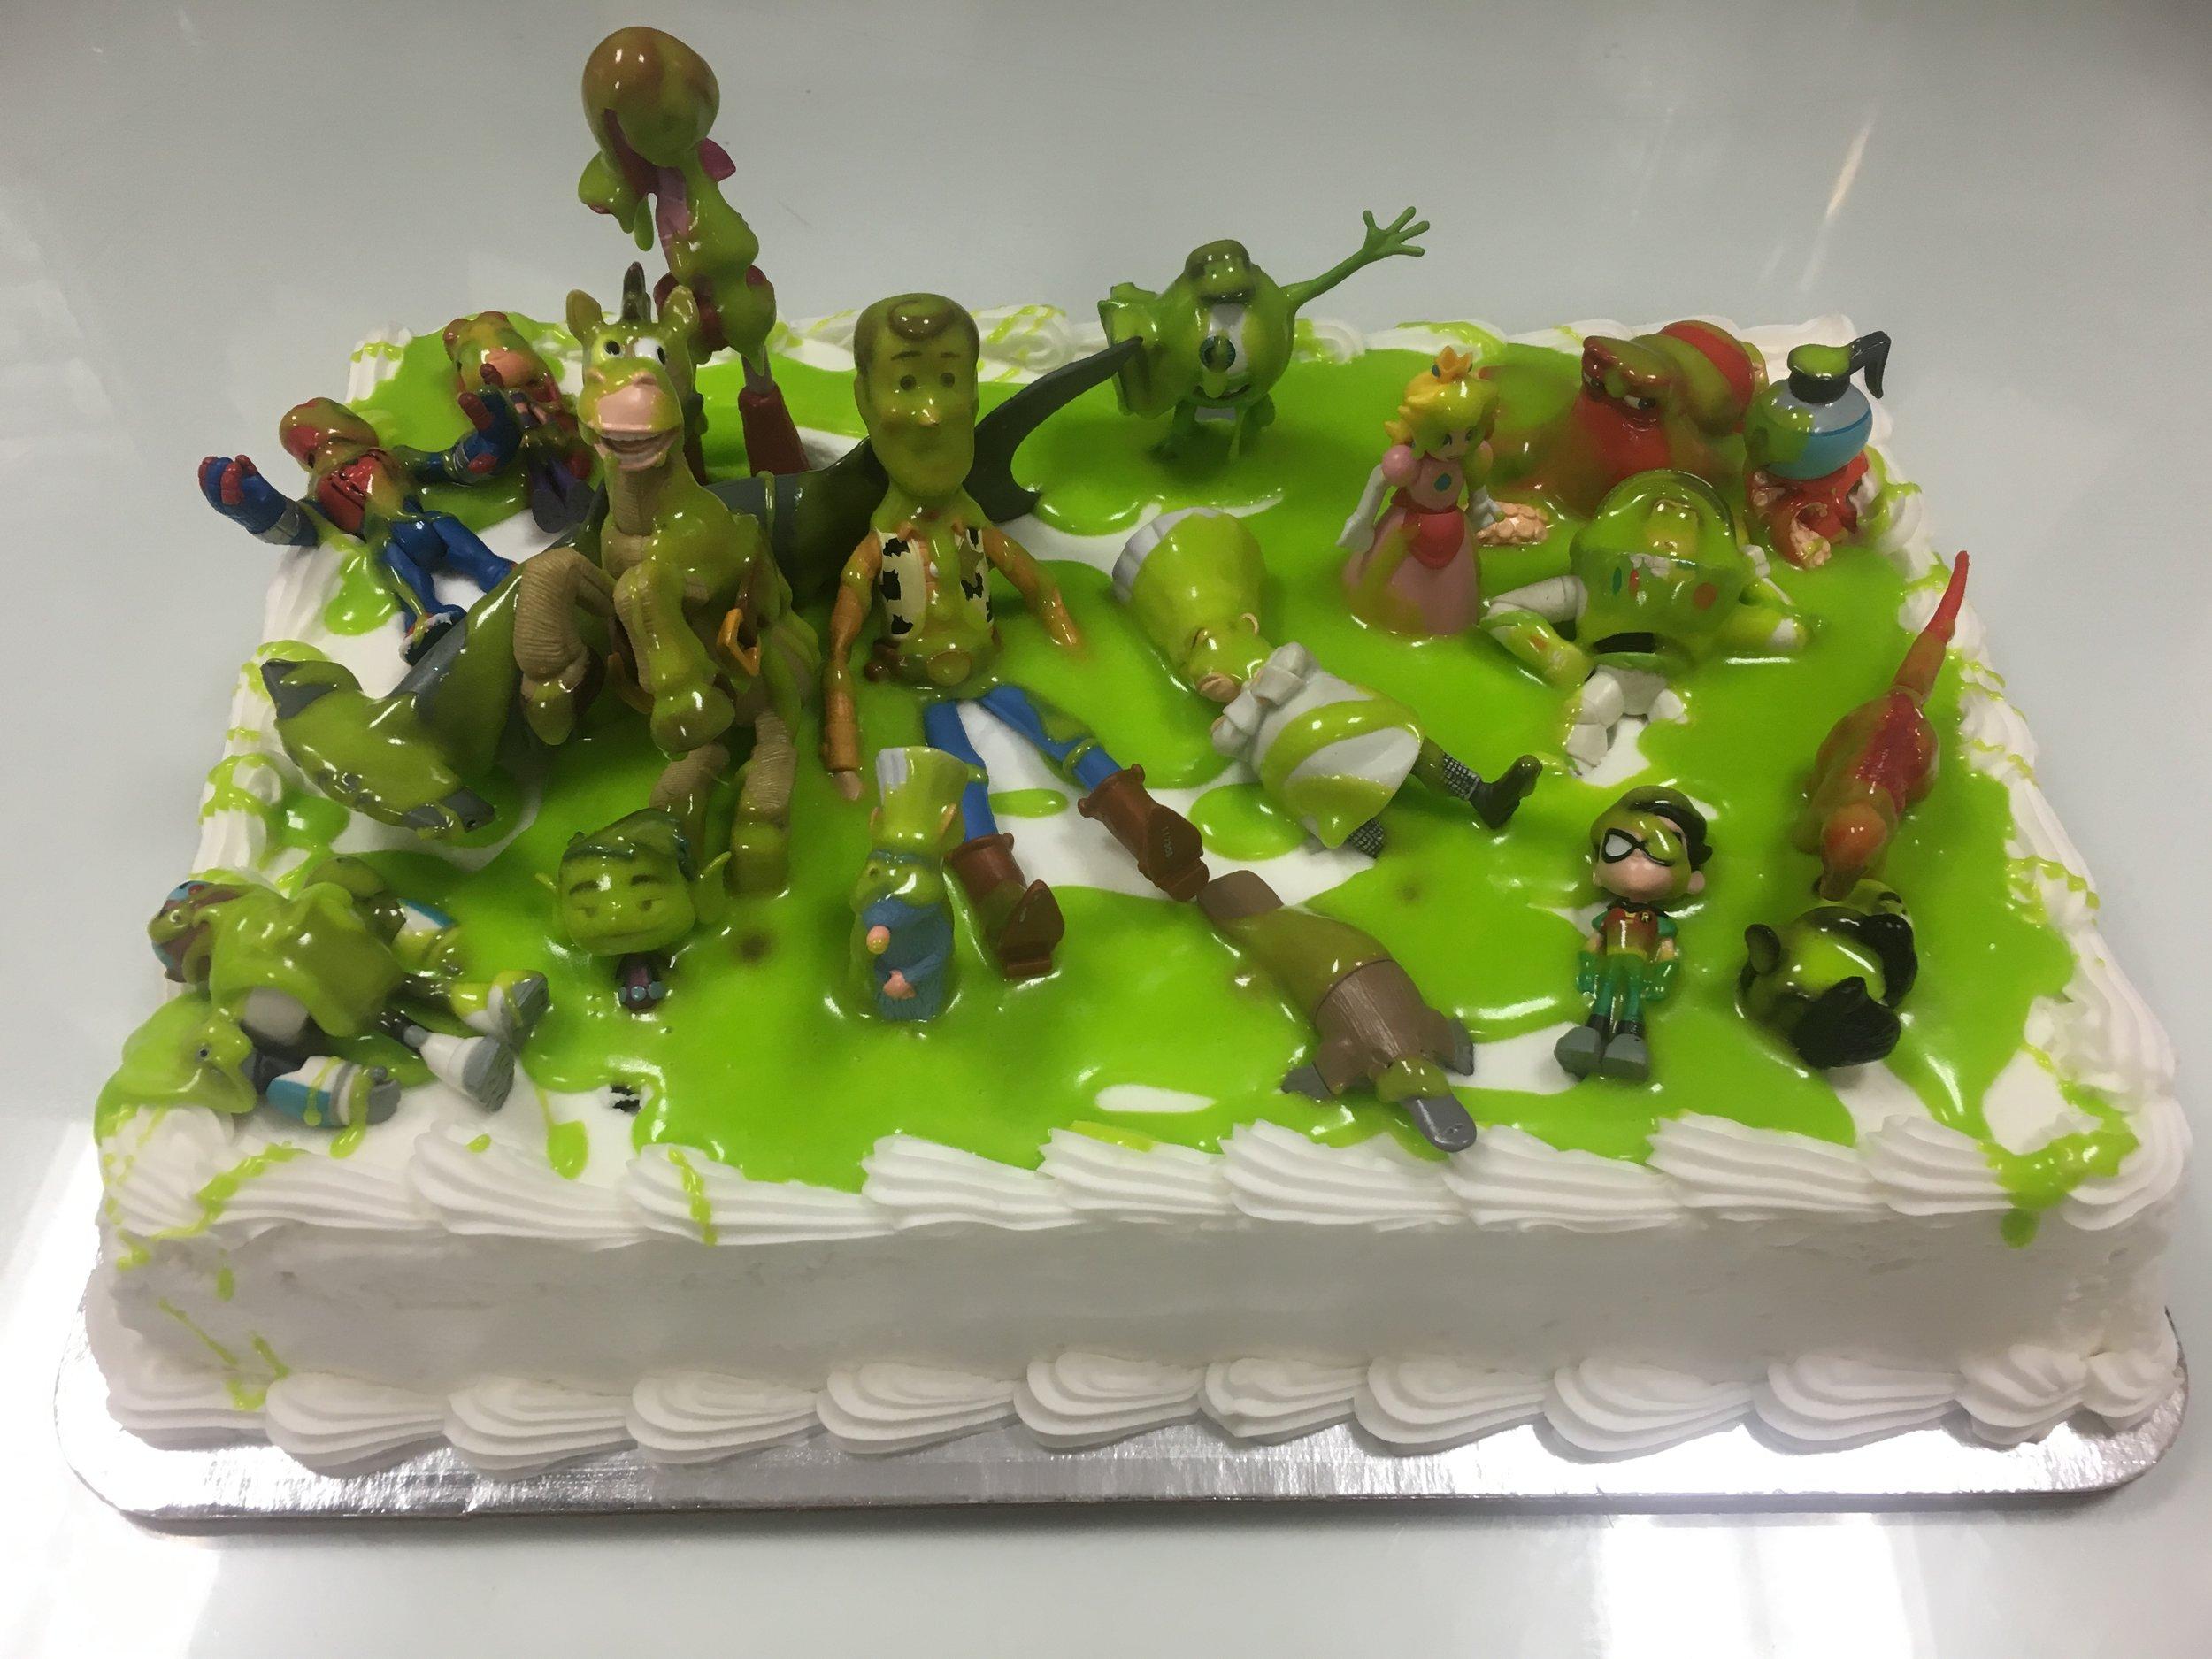 Green Slime Cake